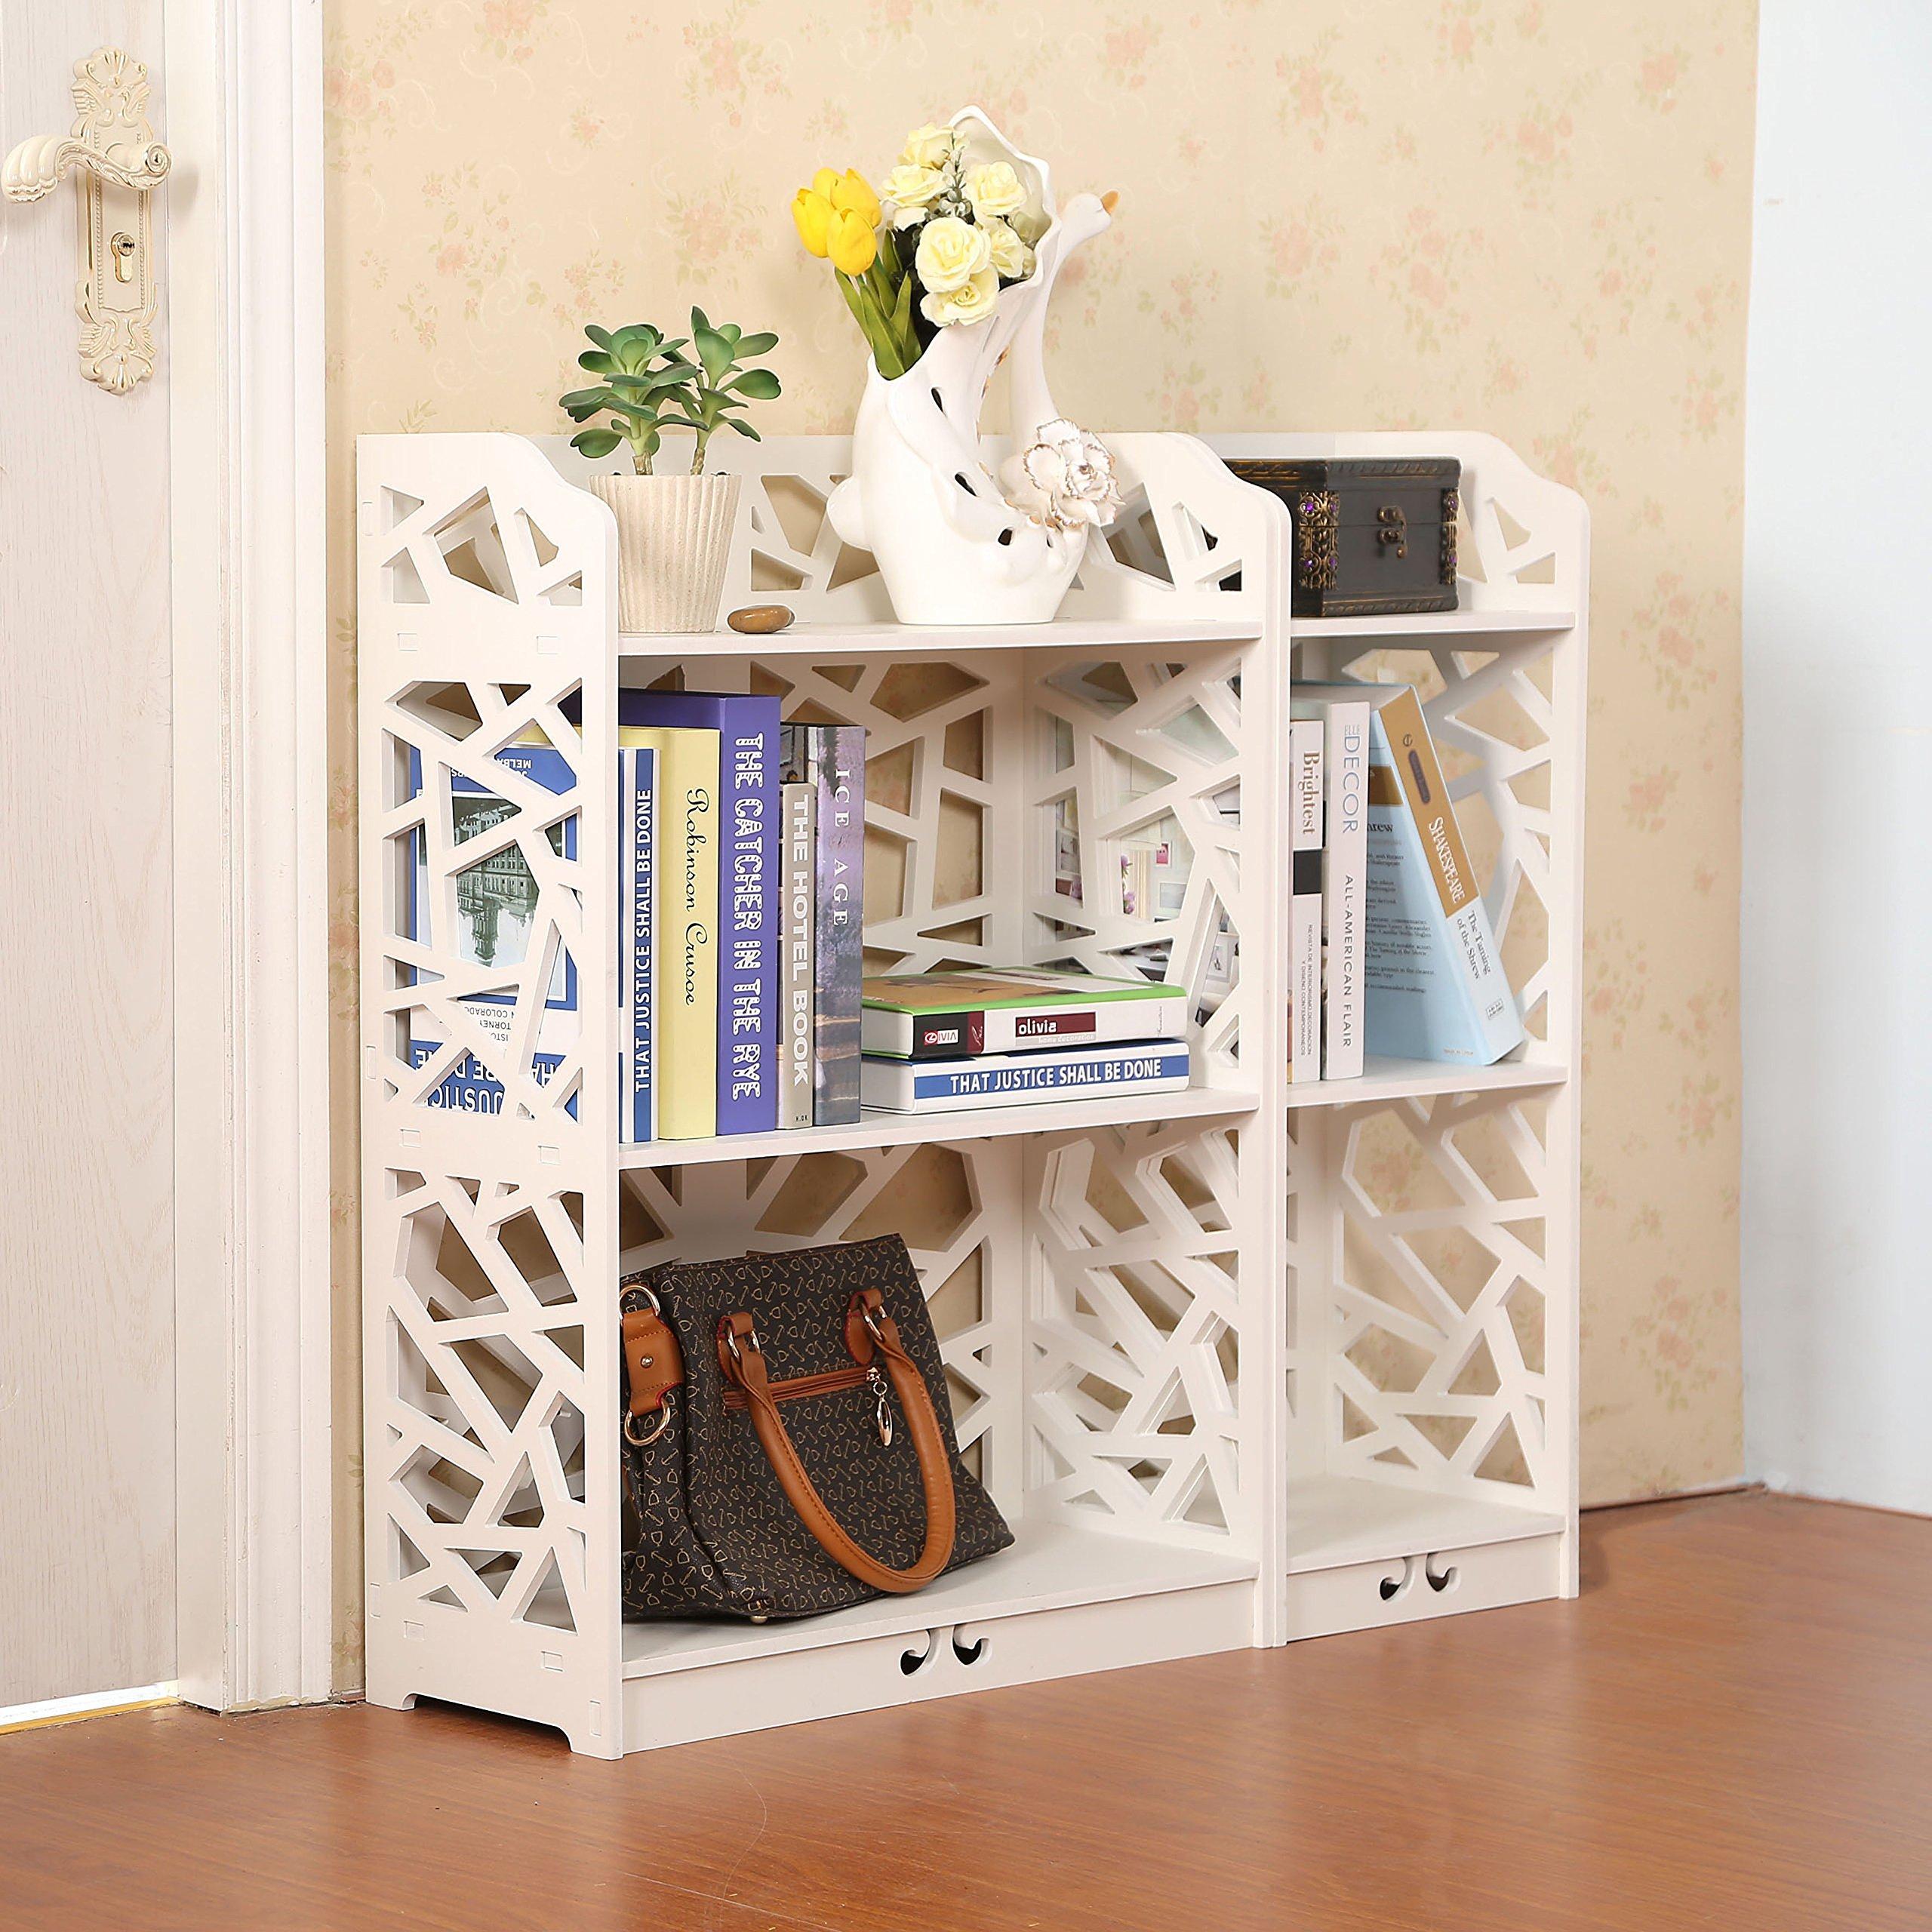 D-Line Wood and Plastic Bookcase Bookshelf Storage Shelf, White, Set of 2 by D-Line